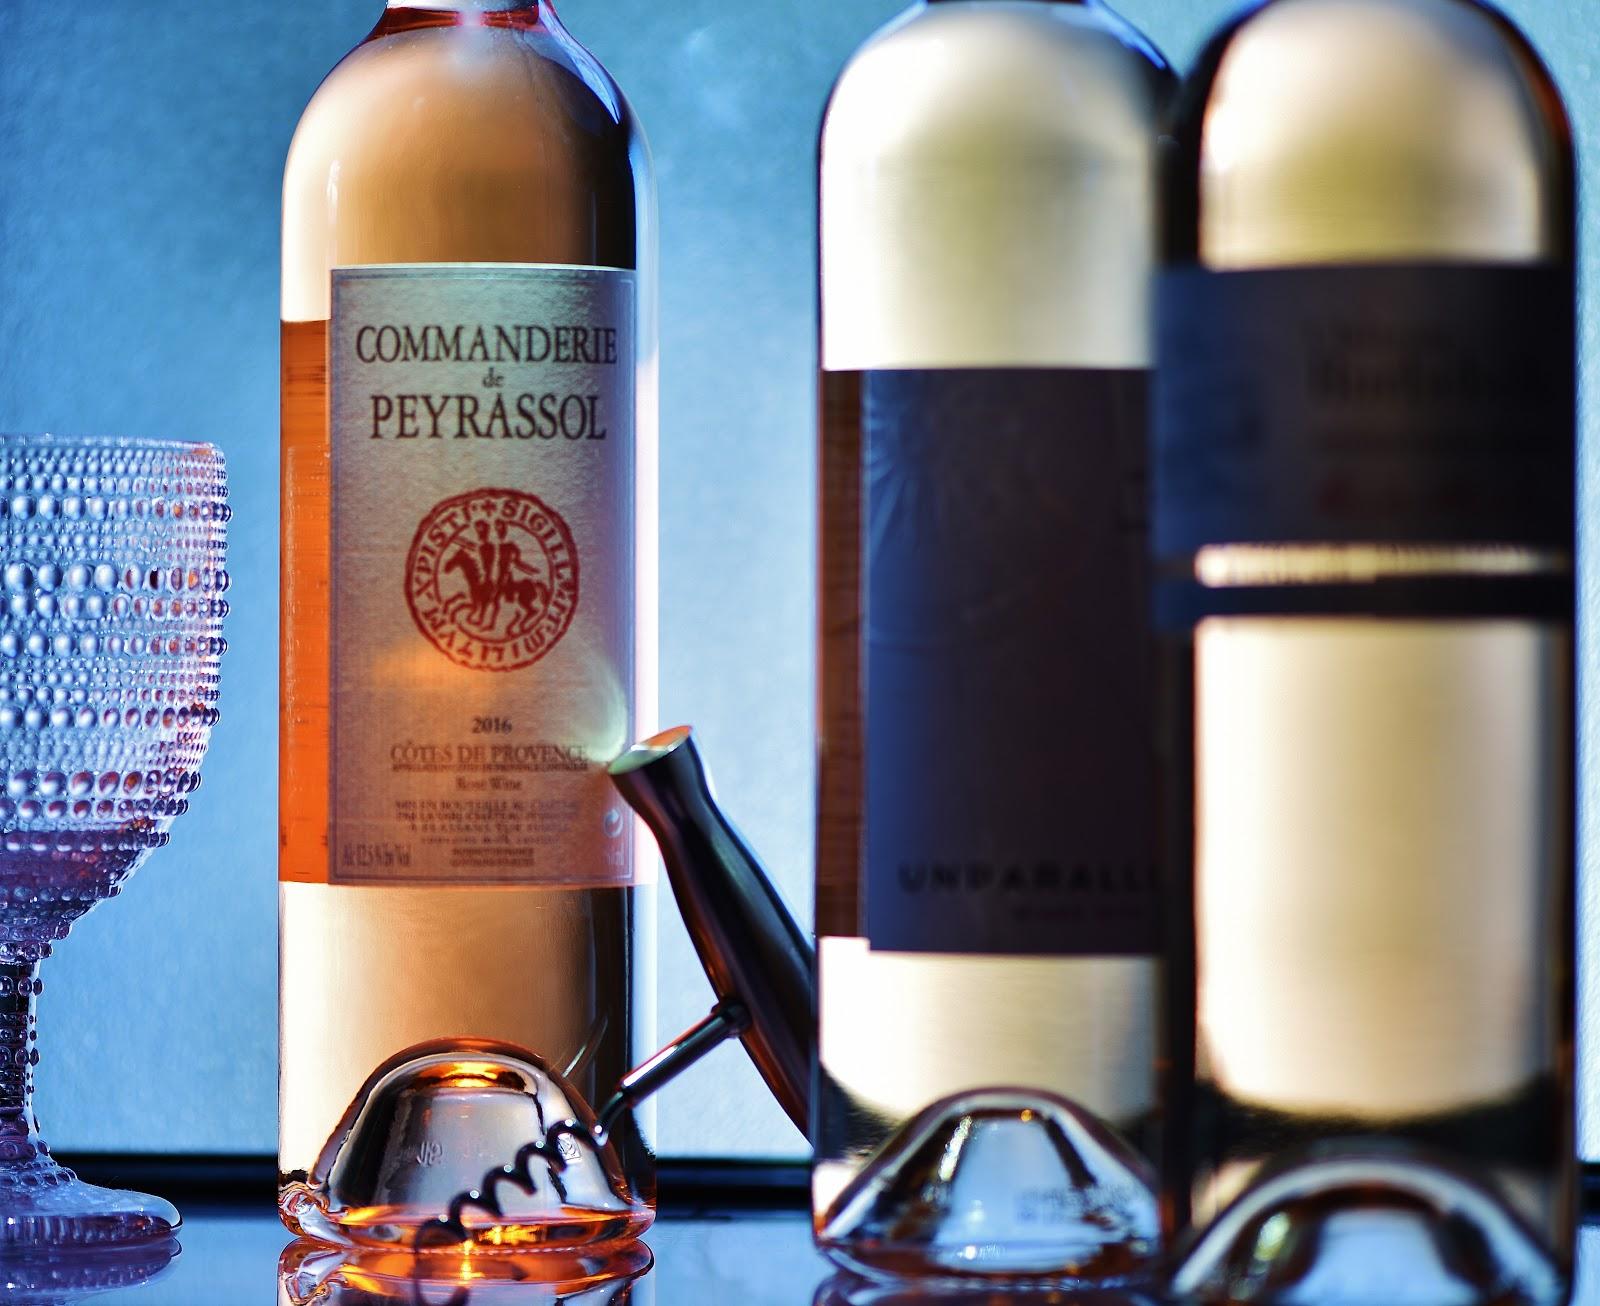 new hampshire wine man chateau peyrassol 2016 commanderie de peyrassol c tes de provence ros. Black Bedroom Furniture Sets. Home Design Ideas